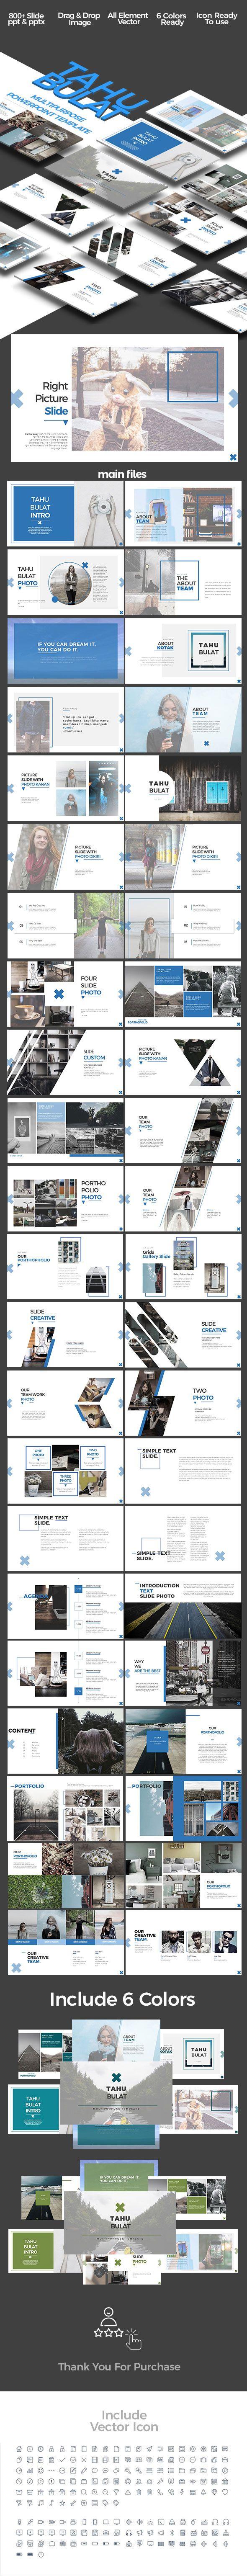 TAHU BULAT - Powerpoint Template | Business powerpoint templates ...